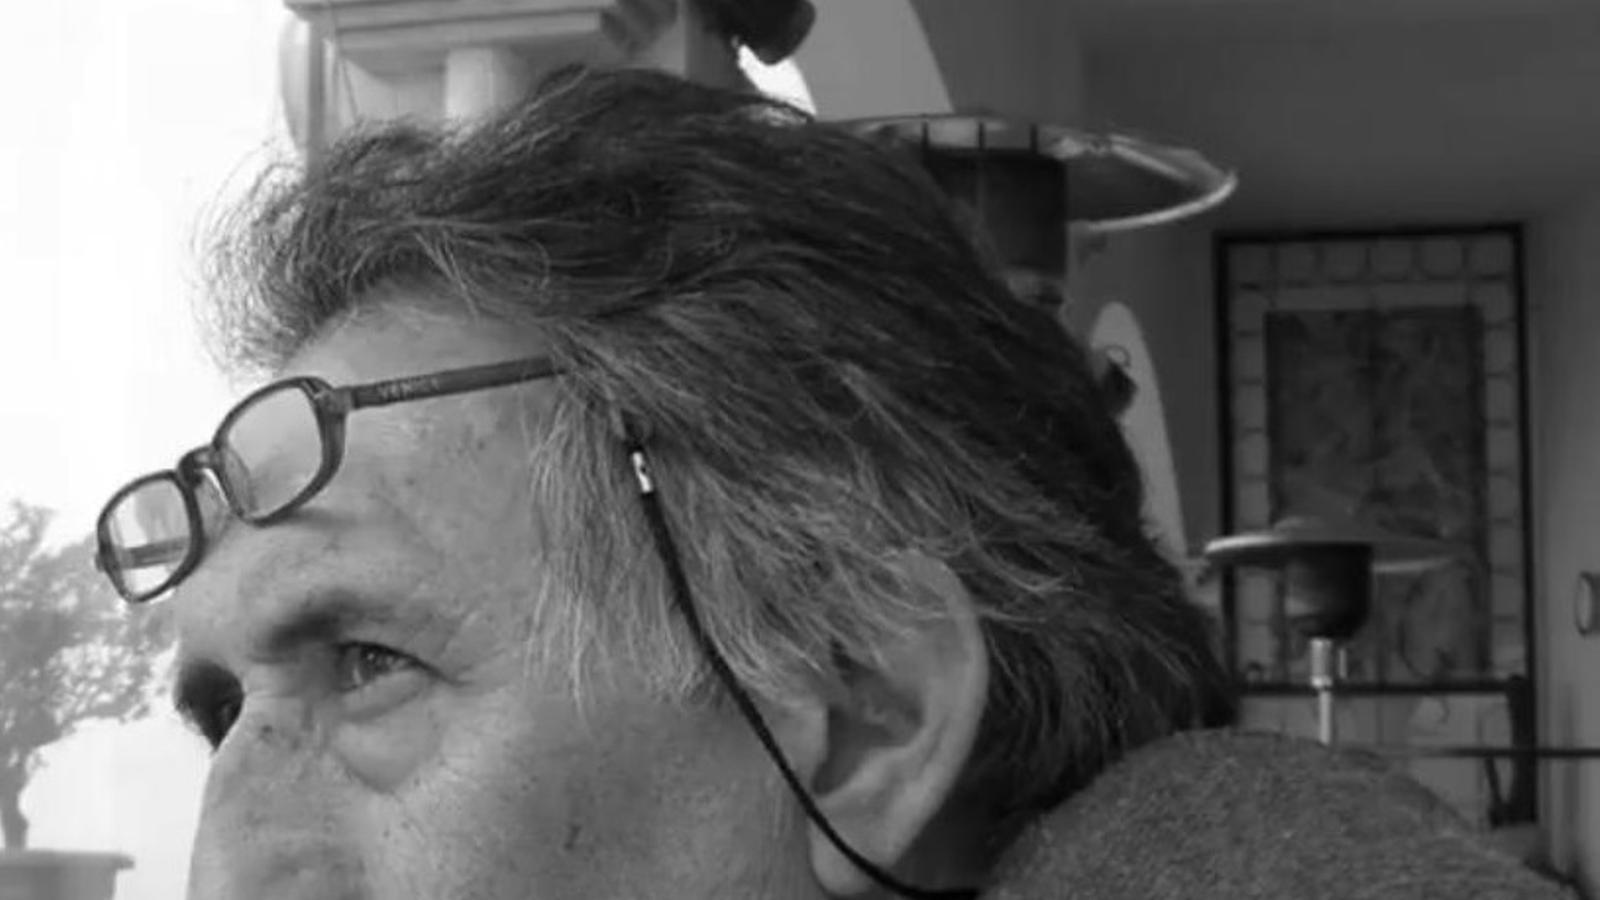 L'arquitecte Moisés Gallego va morir dimecres als 73 anys